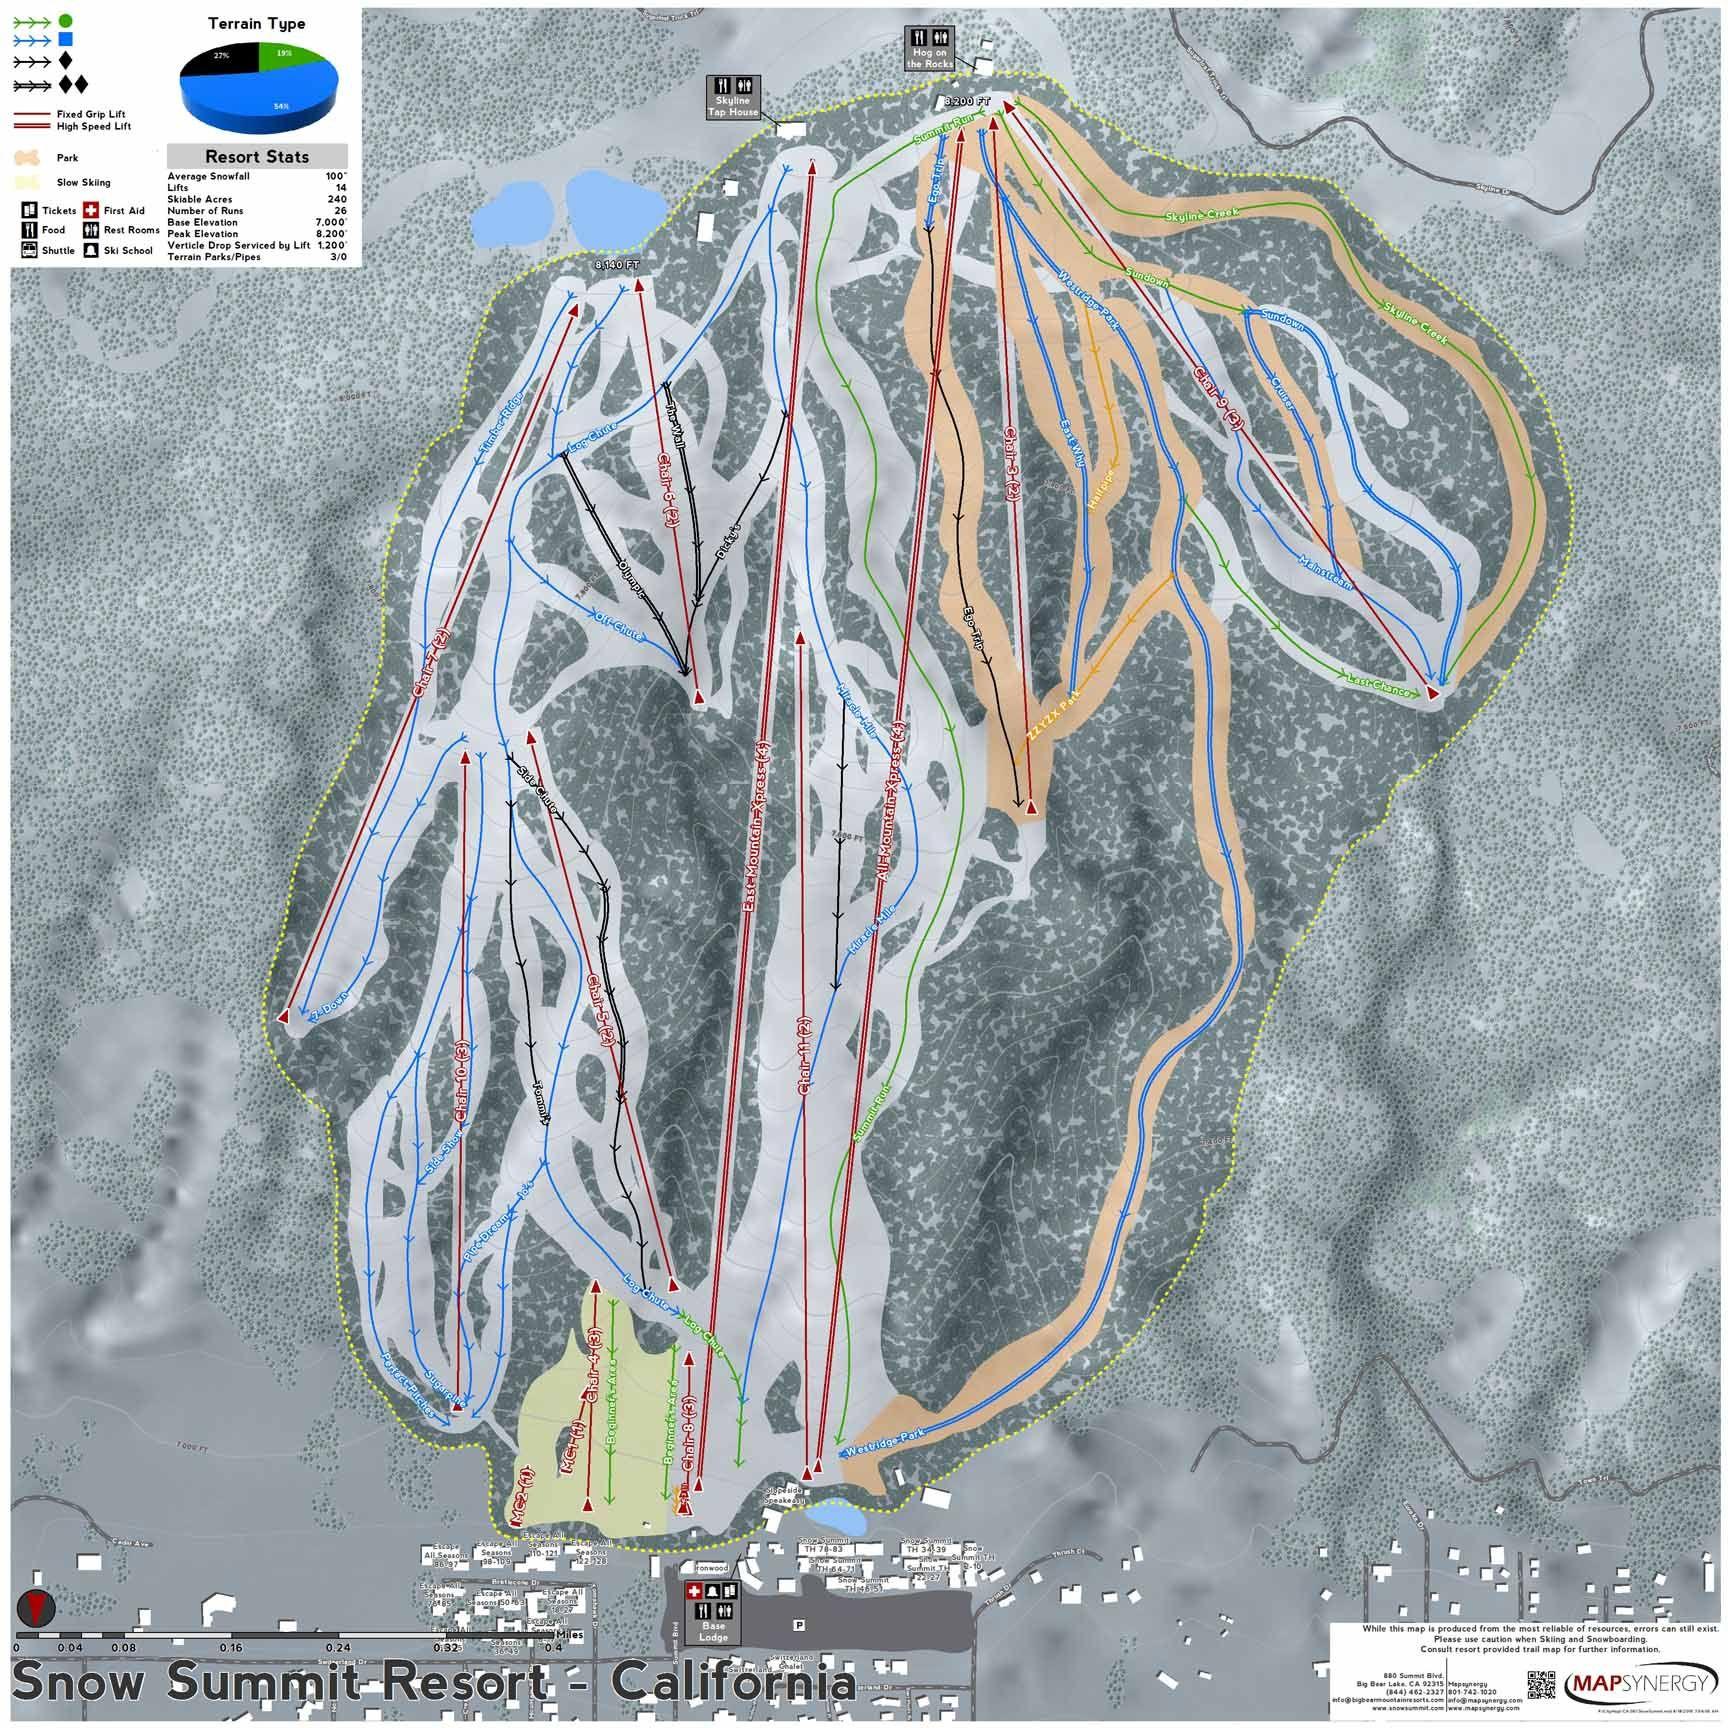 Worksheet. Snow Summit Resort ski map  California Ski Resort Maps